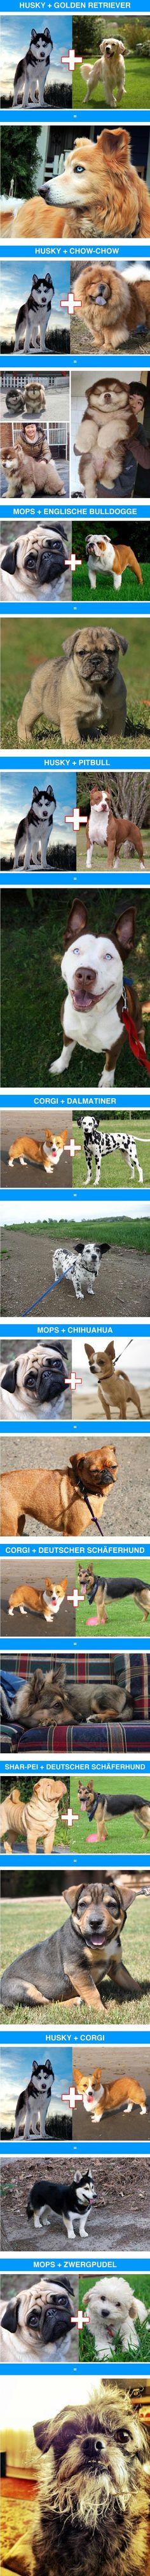 Funny cross-breeds - Imgur